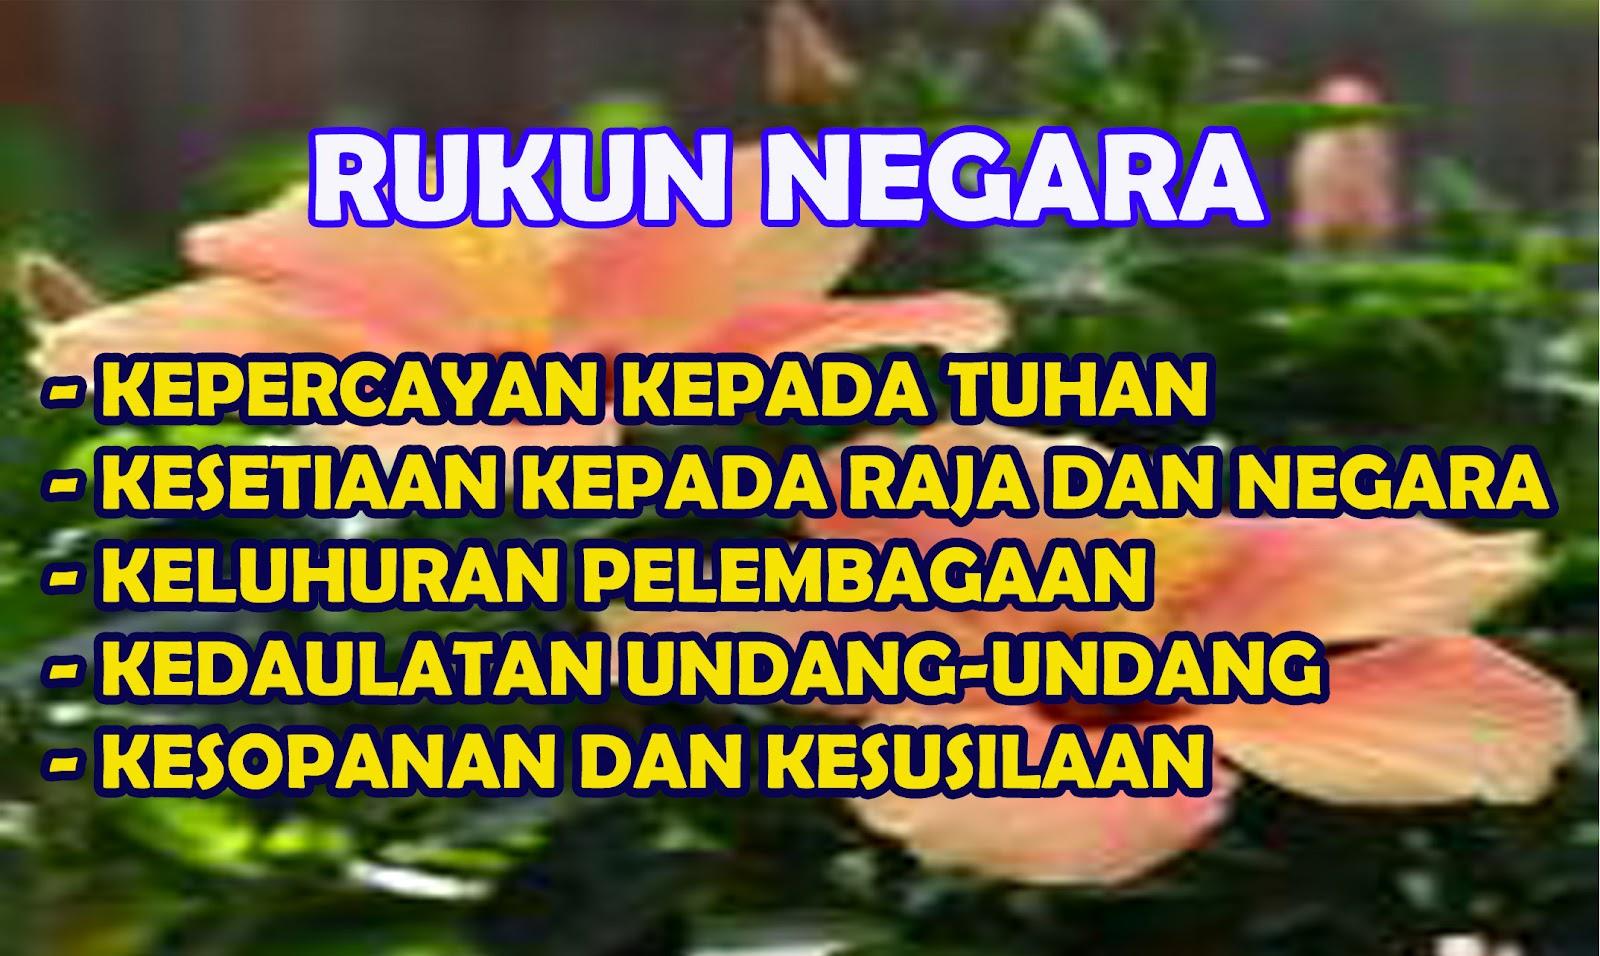 rukun negara Kuala lumpur: community activist tan sri lee lam thye has urged the government to look into the possibility of creating a rukun negara foundation.